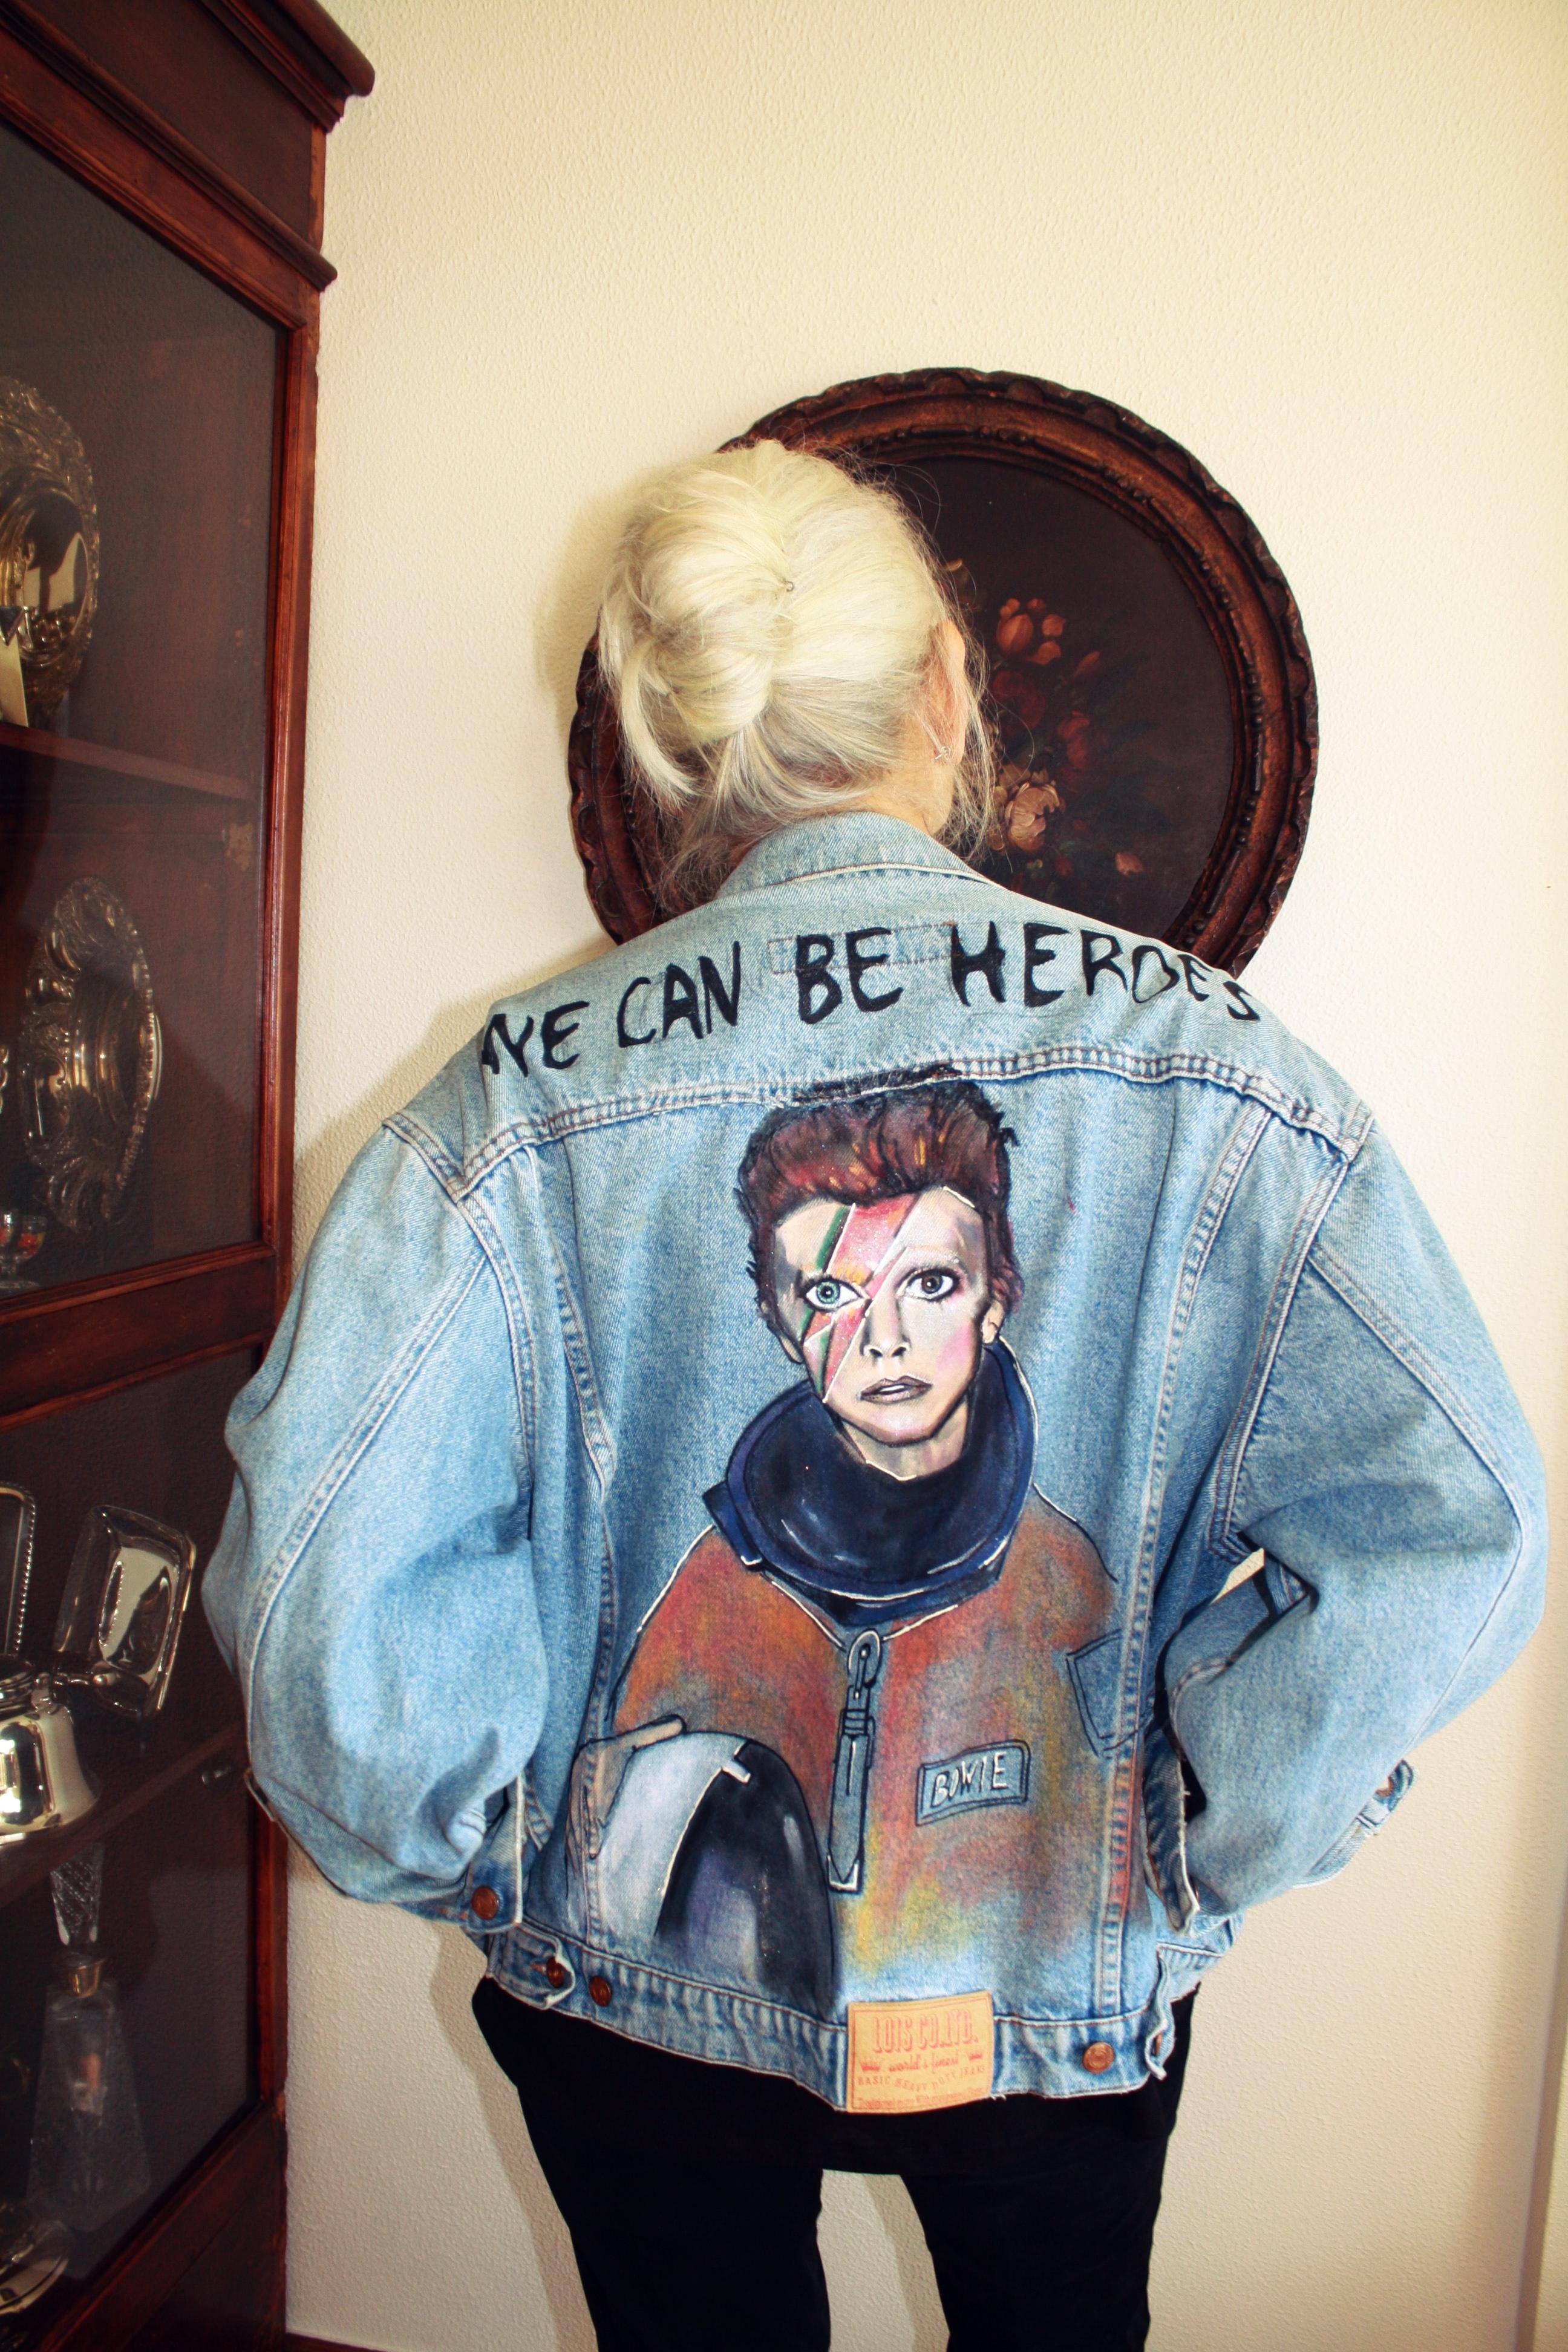 David Bowie, Starman!